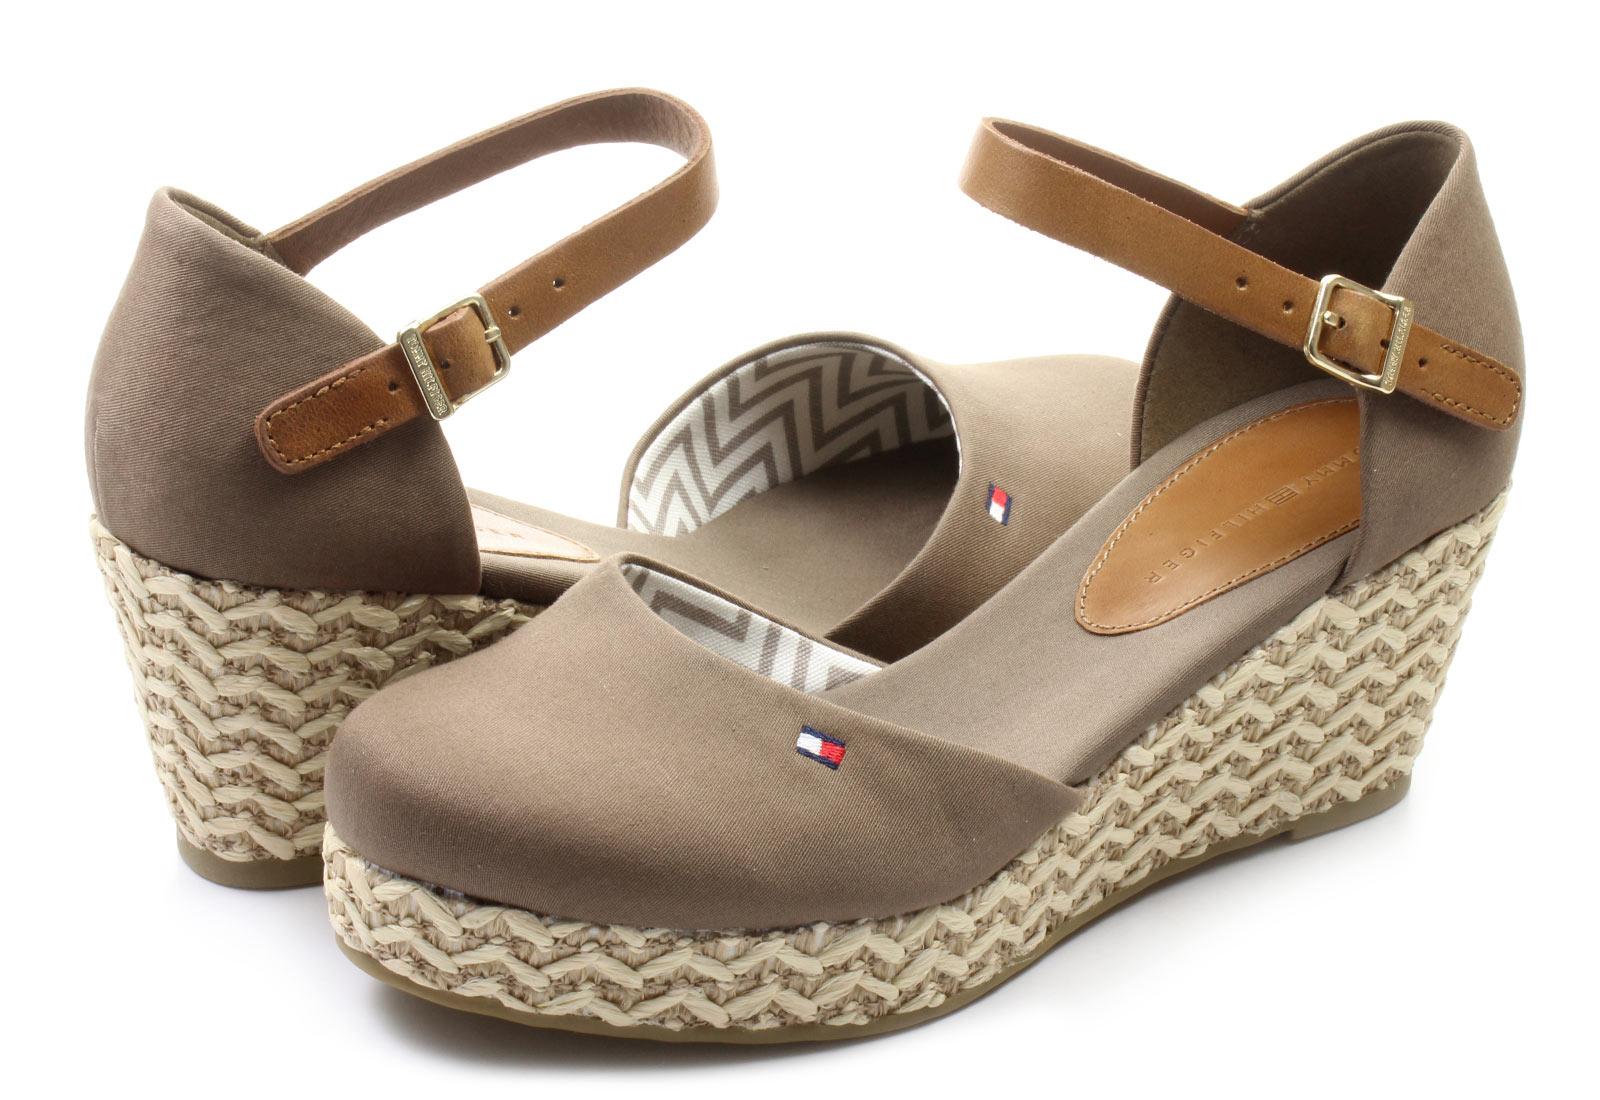 tommy hilfiger sandals elba 18d 15s 8532 230 online shop for sneakers shoes and boots. Black Bedroom Furniture Sets. Home Design Ideas